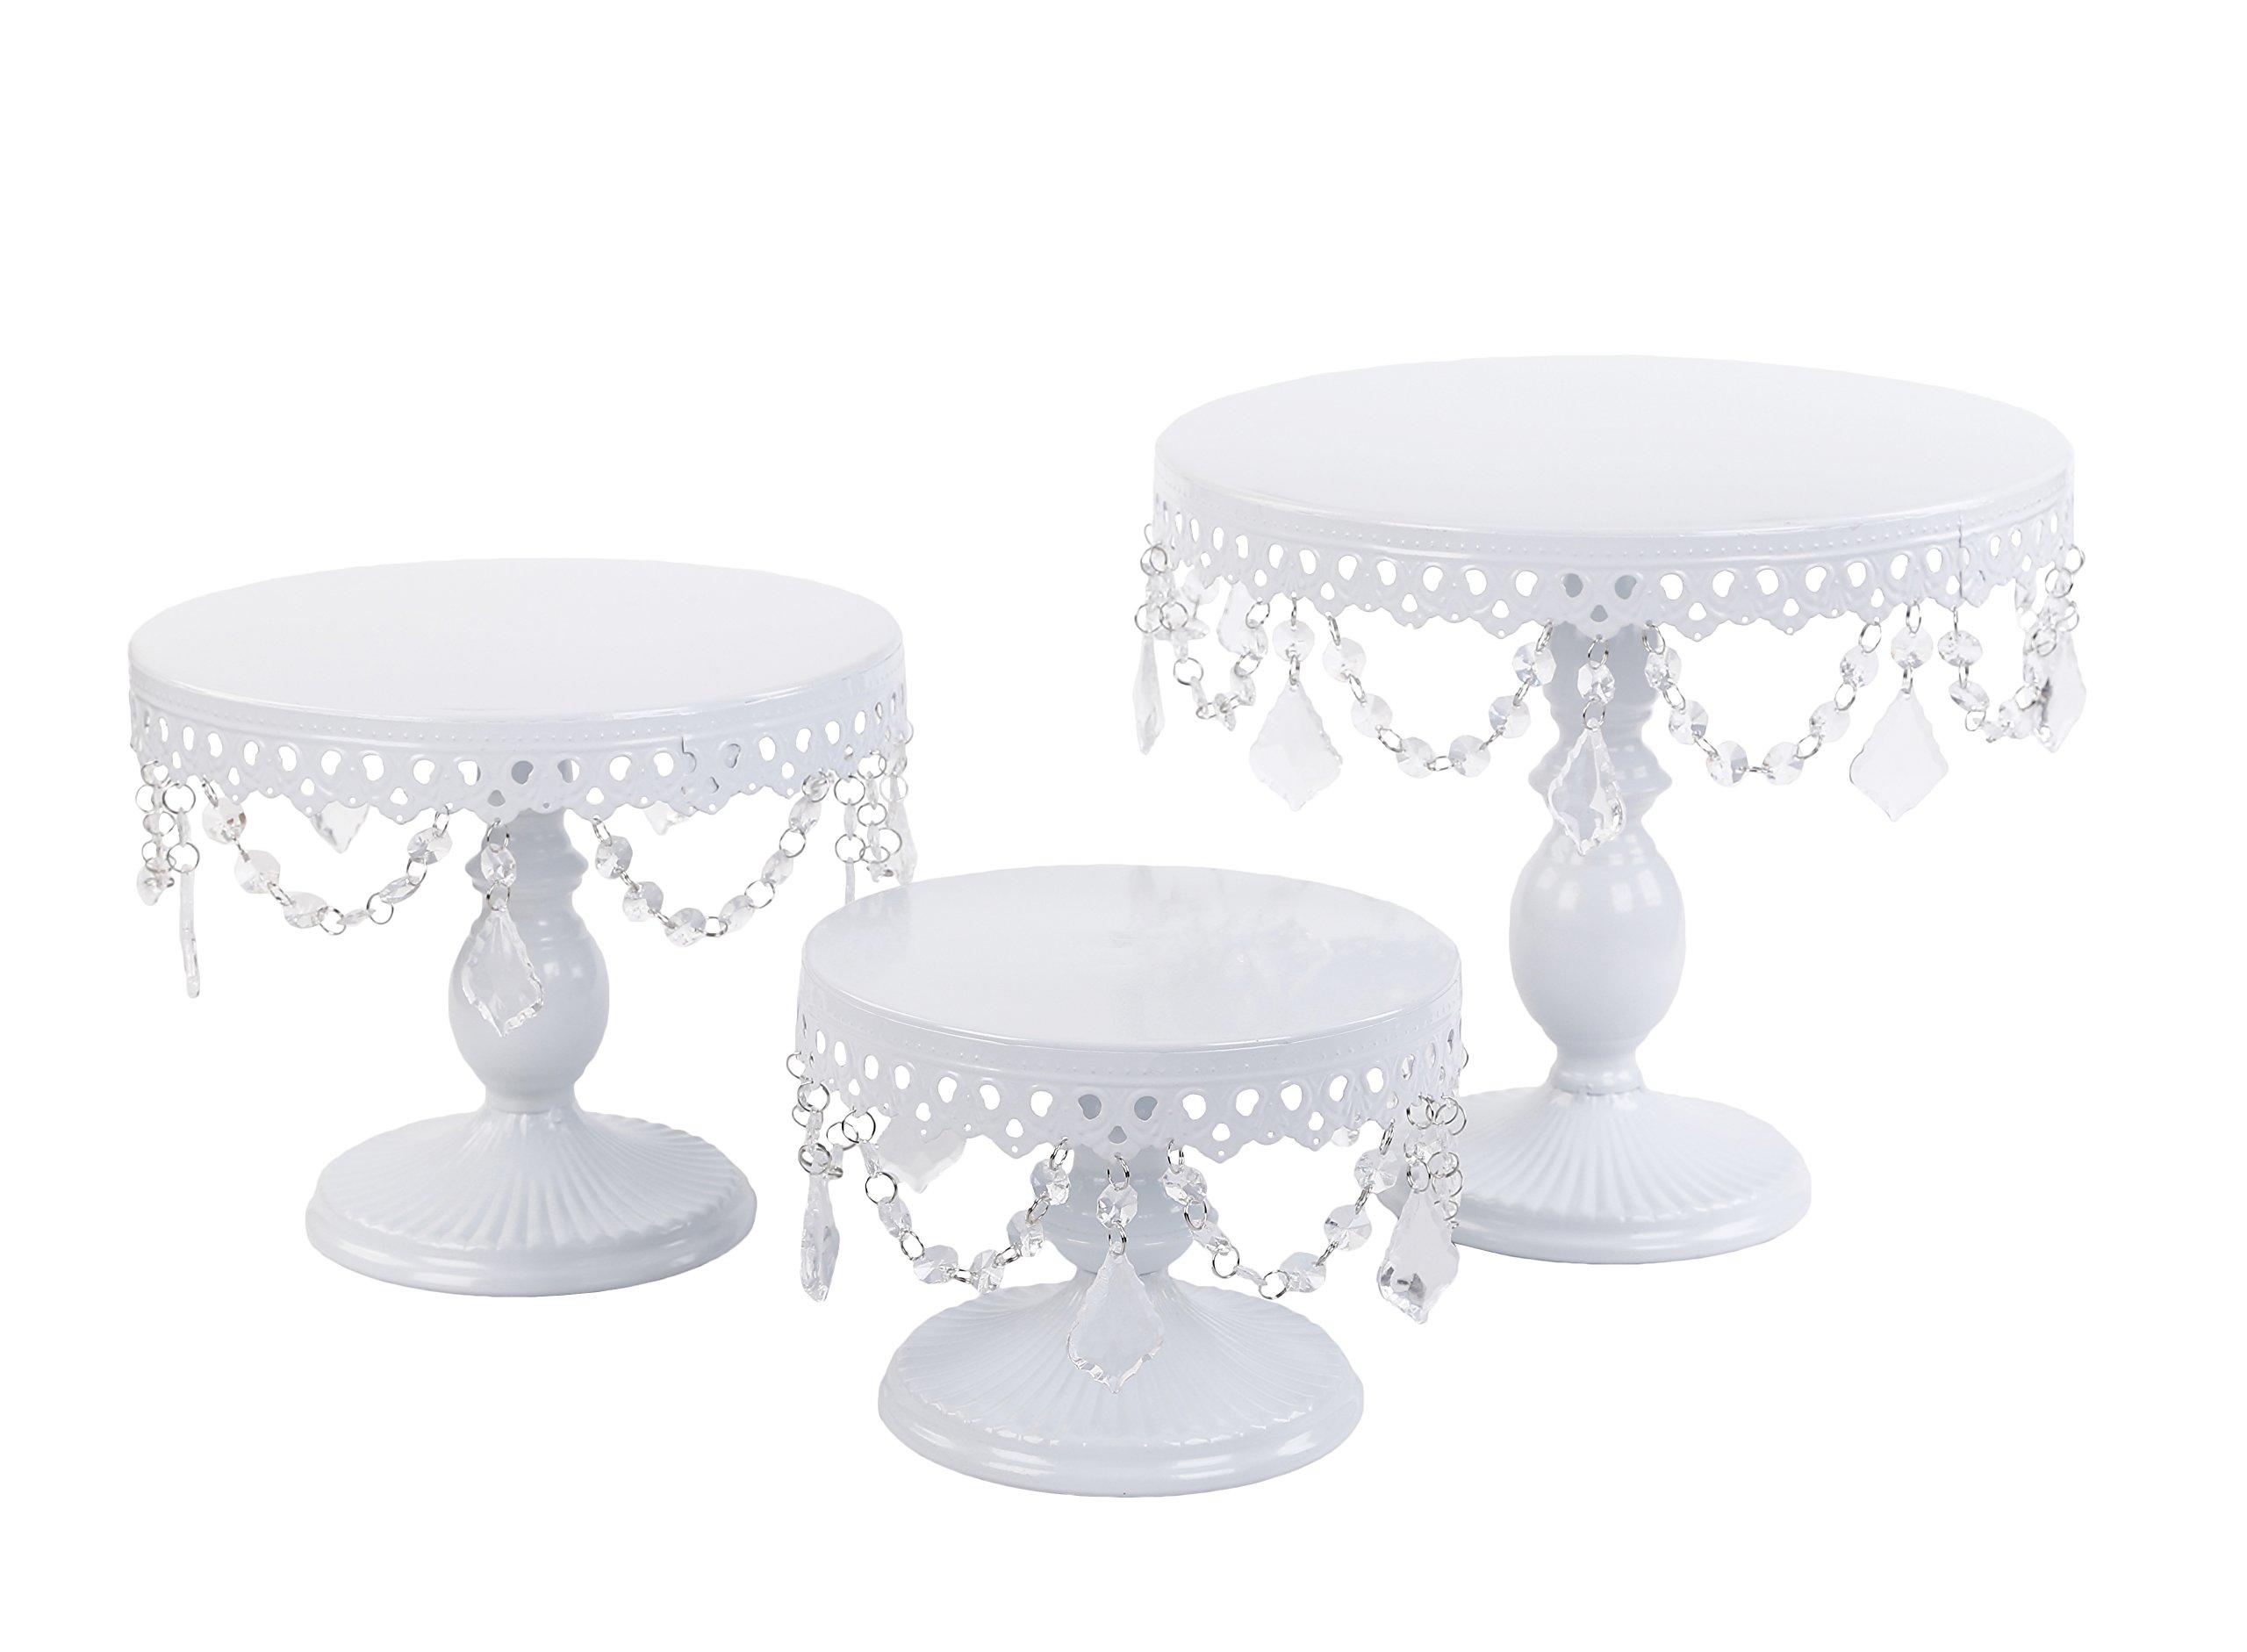 VILAVITA 3-Set Antique Cake Stand Round Cupcake Stands Metal Dessert Display with Crystal Beads, White by VILAVITA